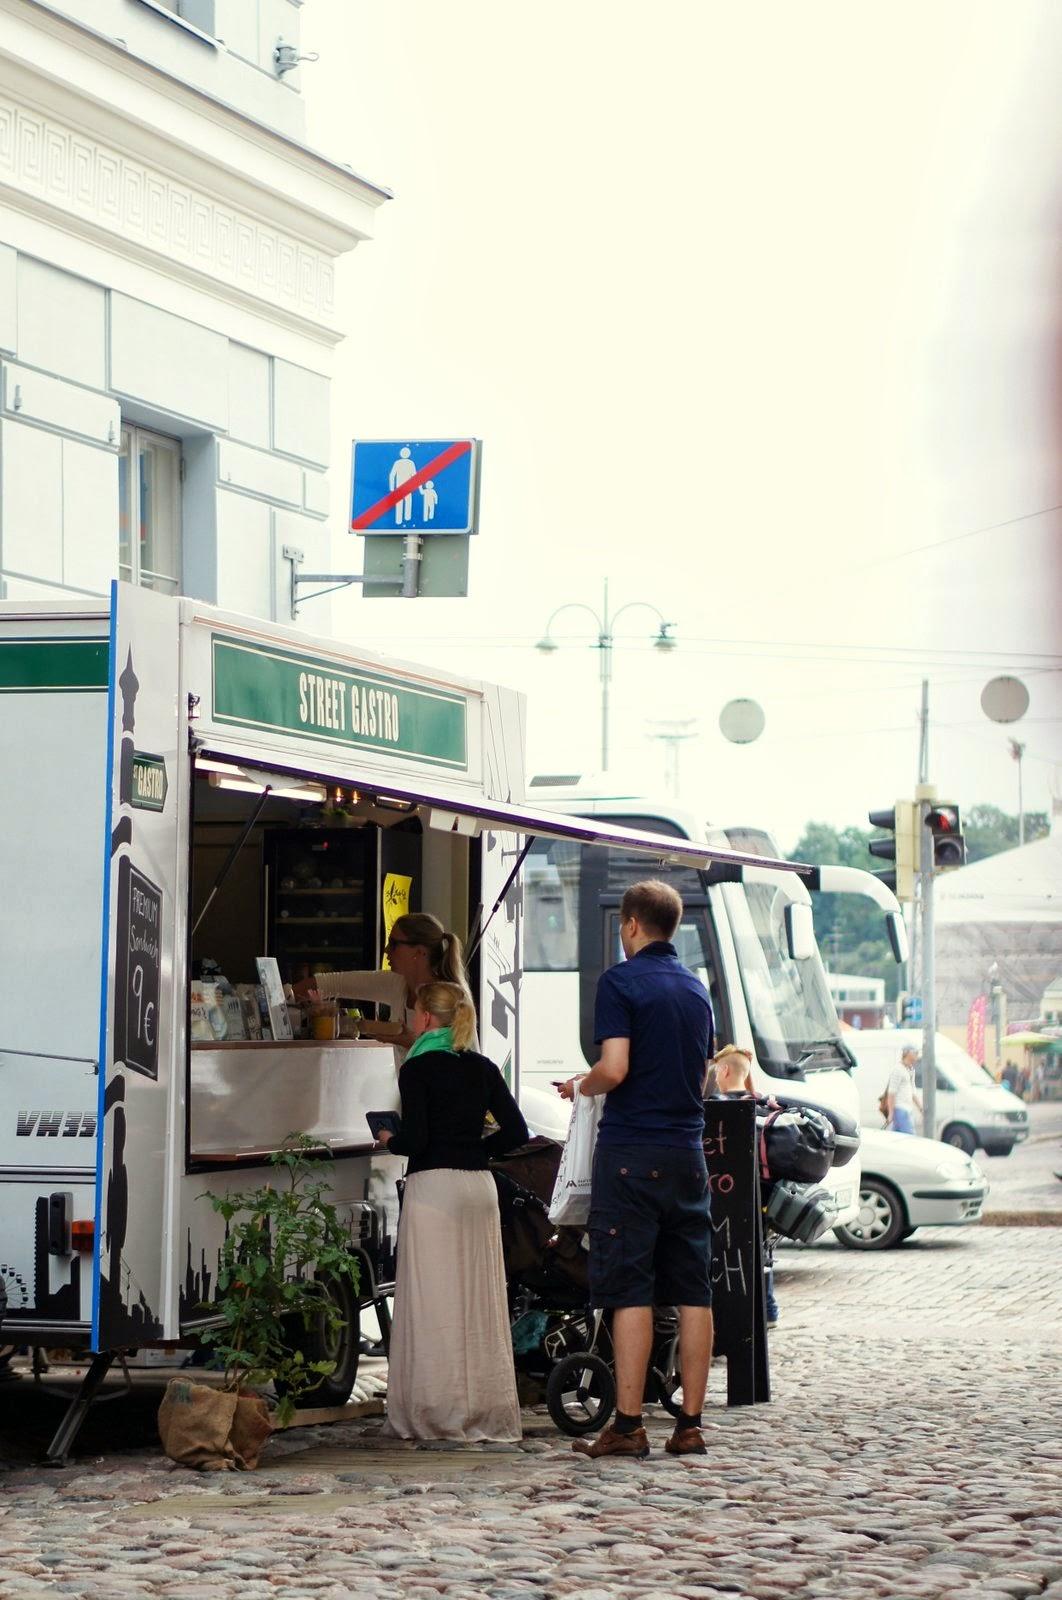 Street Gastro